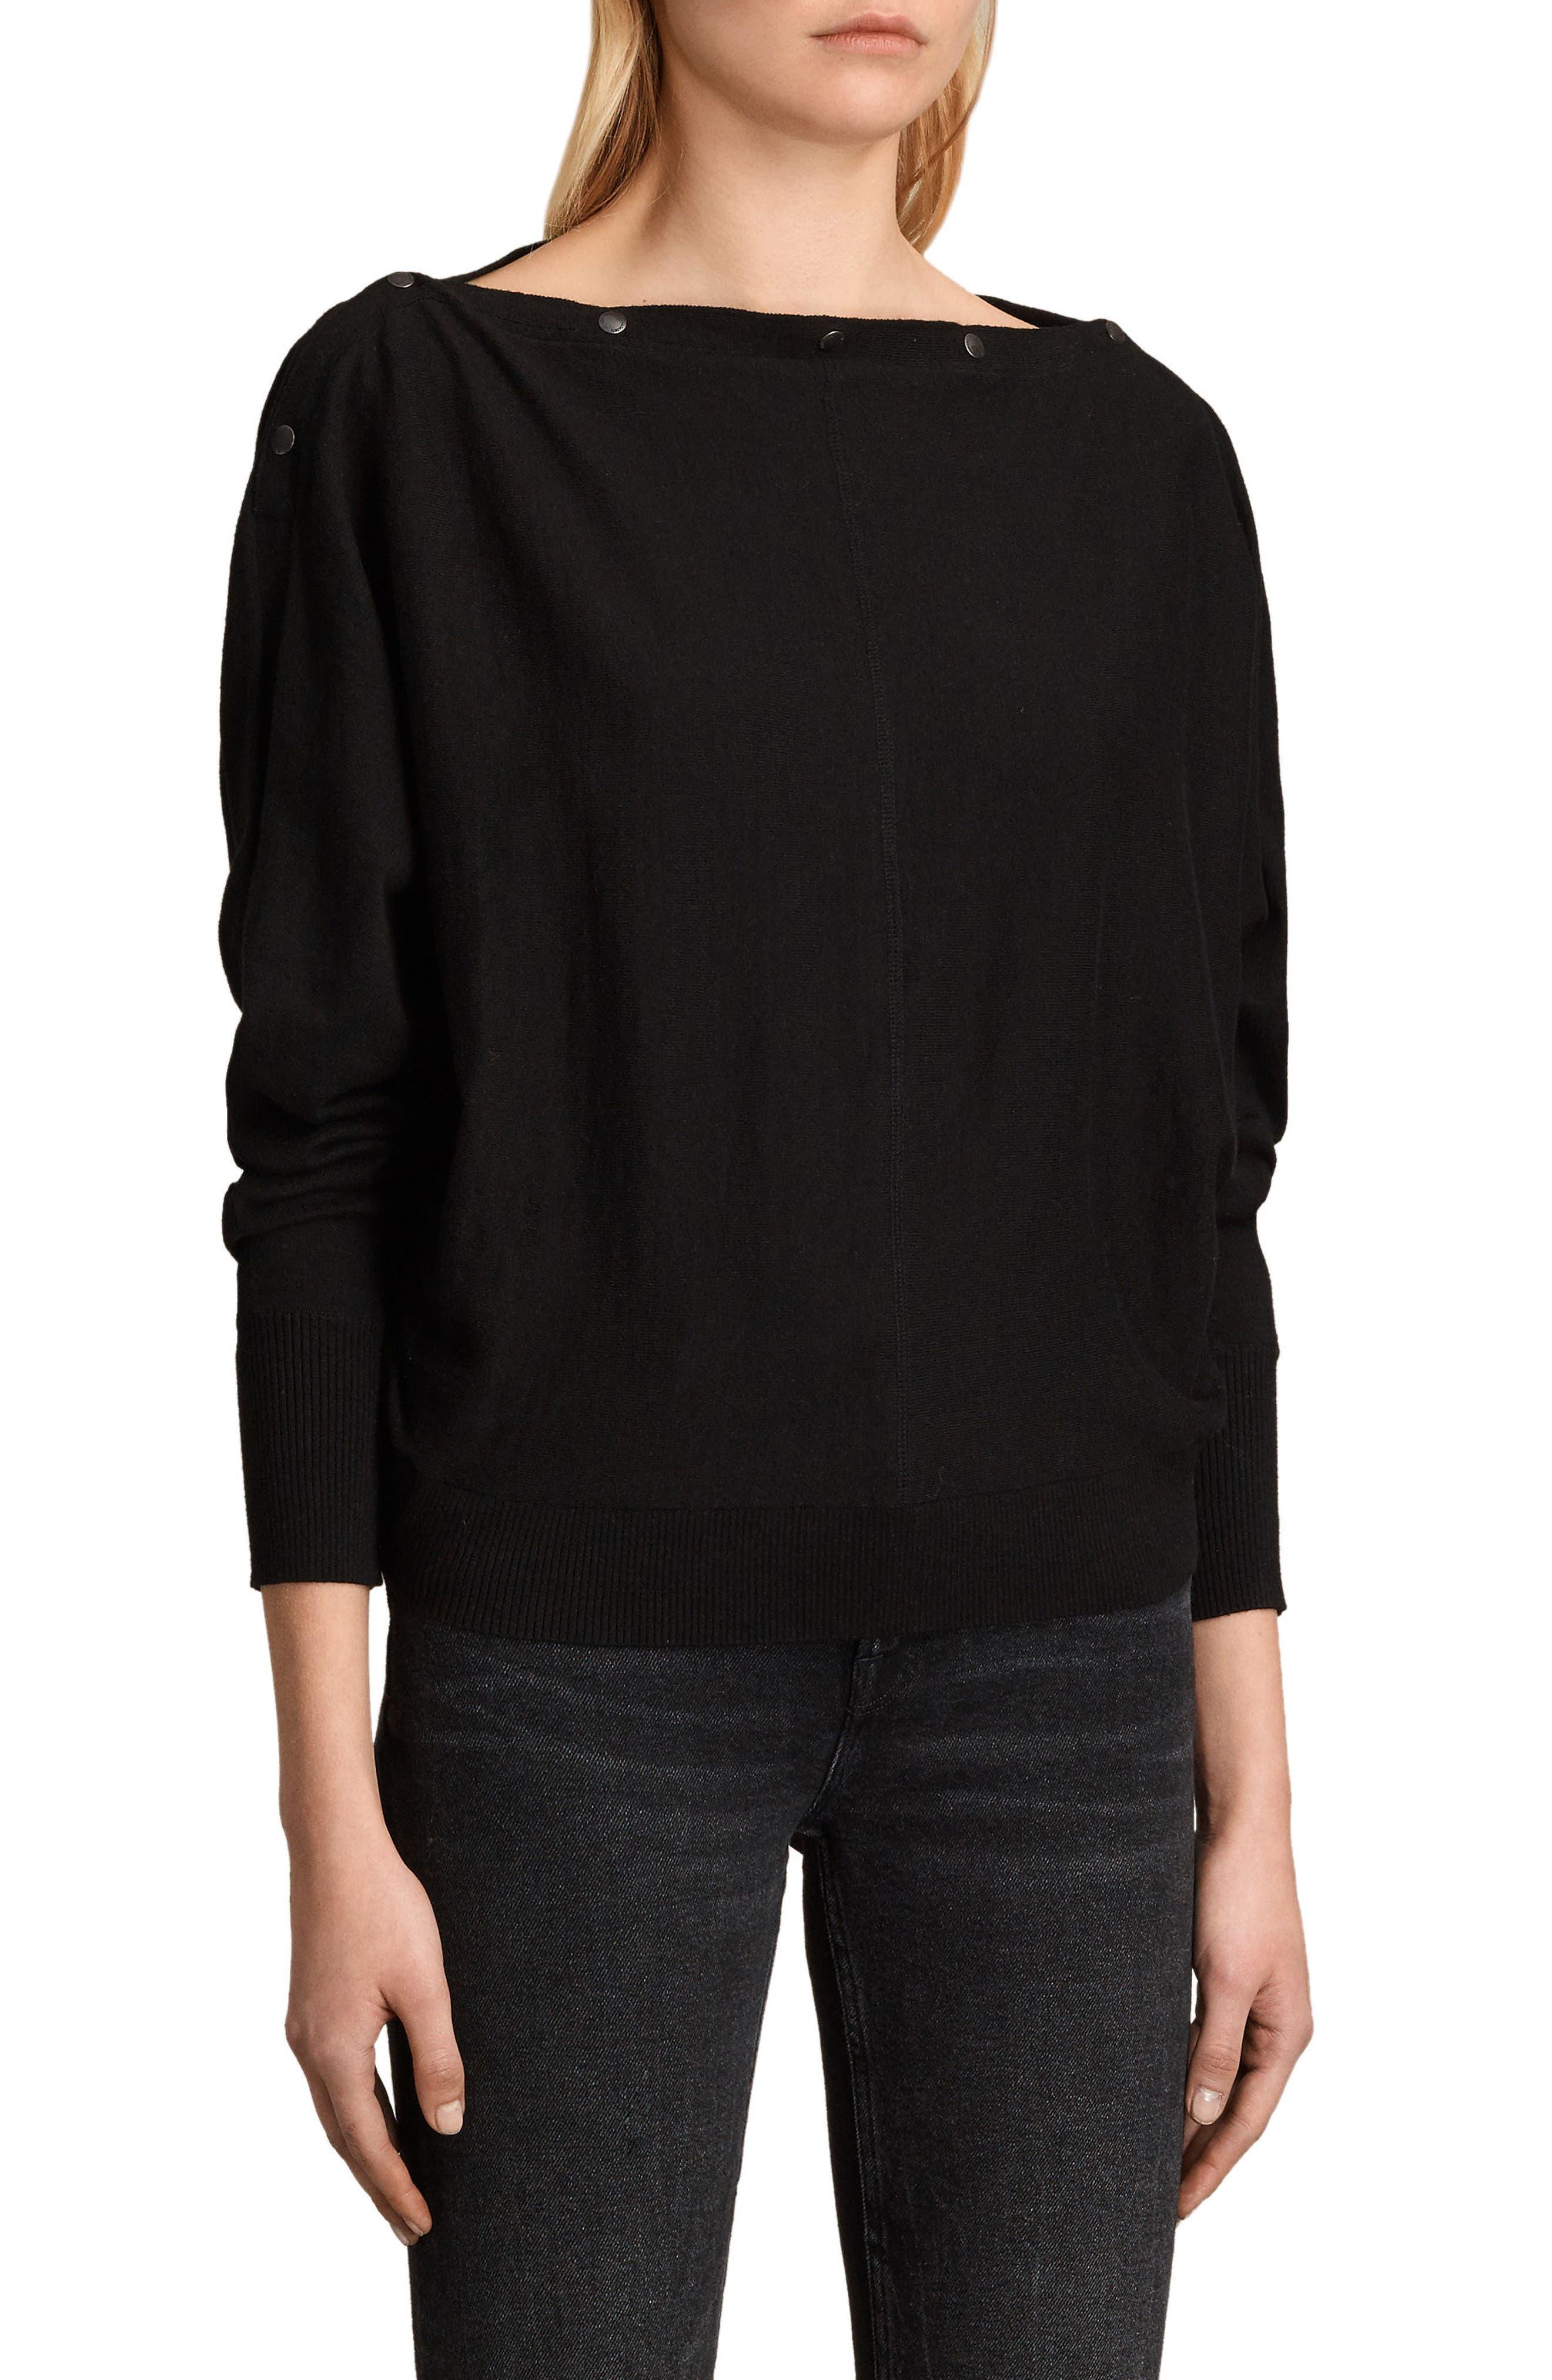 Elle Sweater,                             Alternate thumbnail 3, color,                             Black